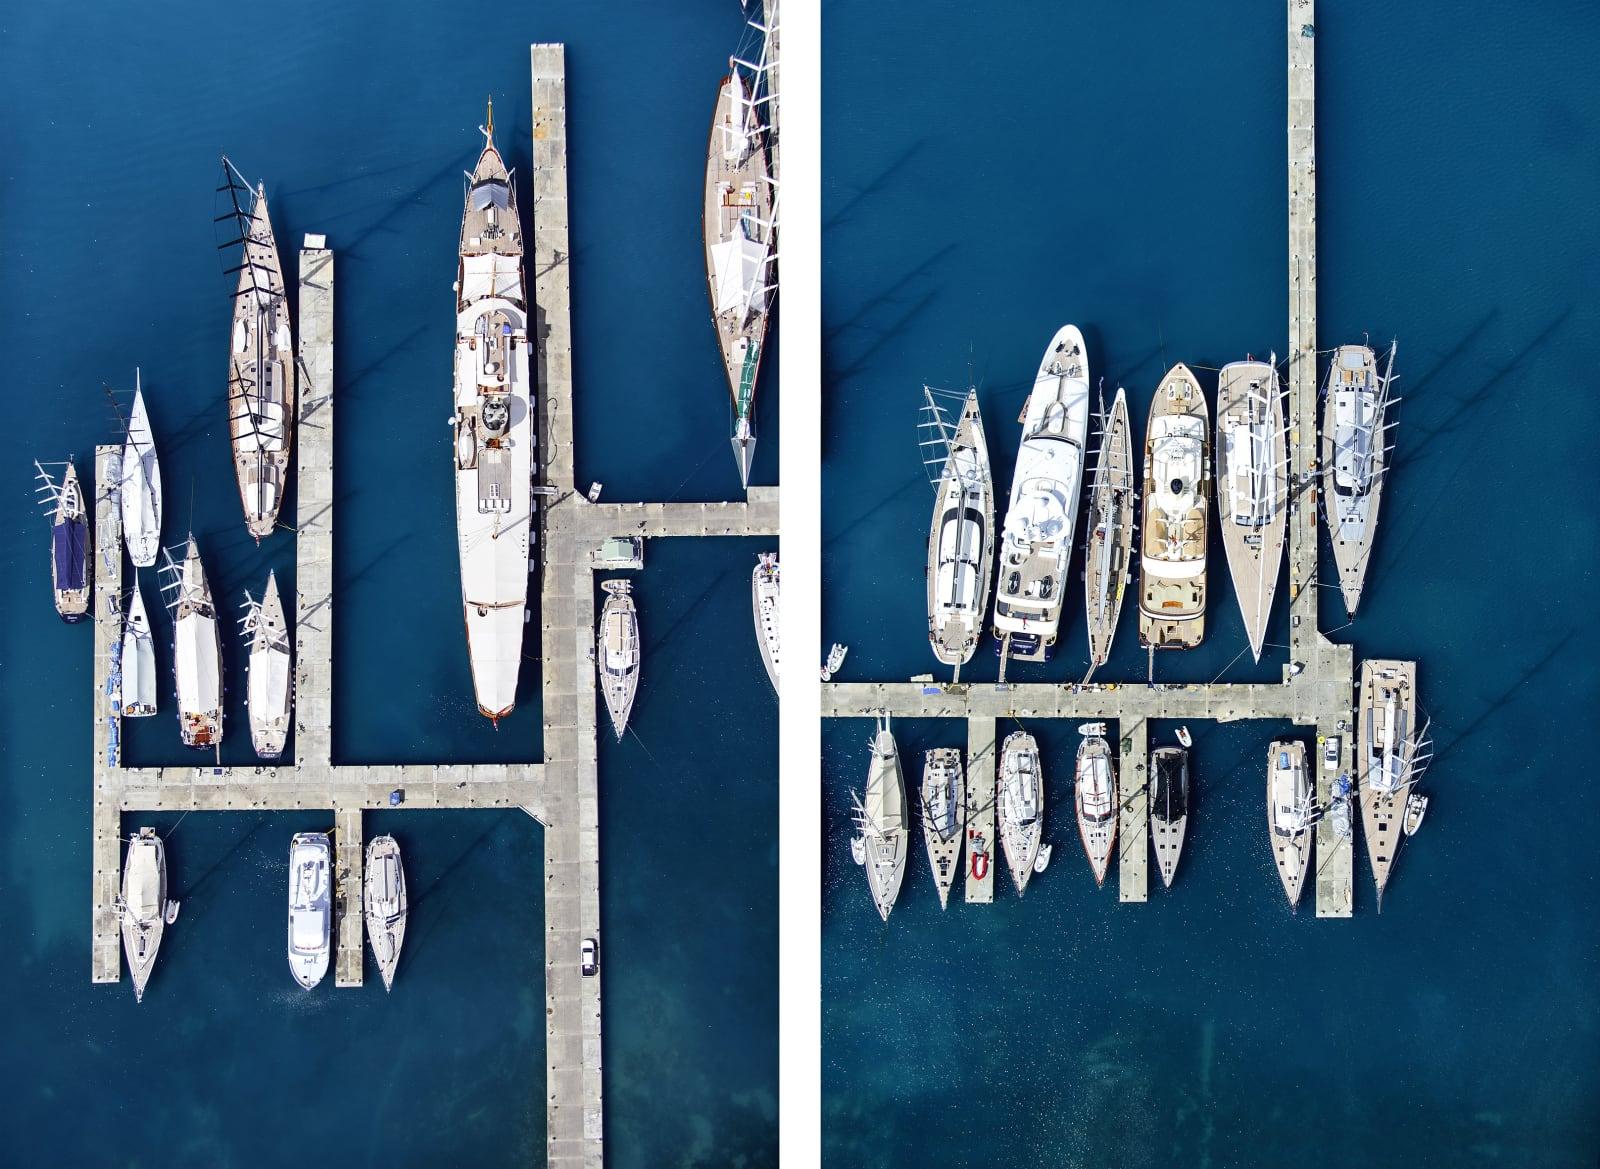 Yacht Club Diptych